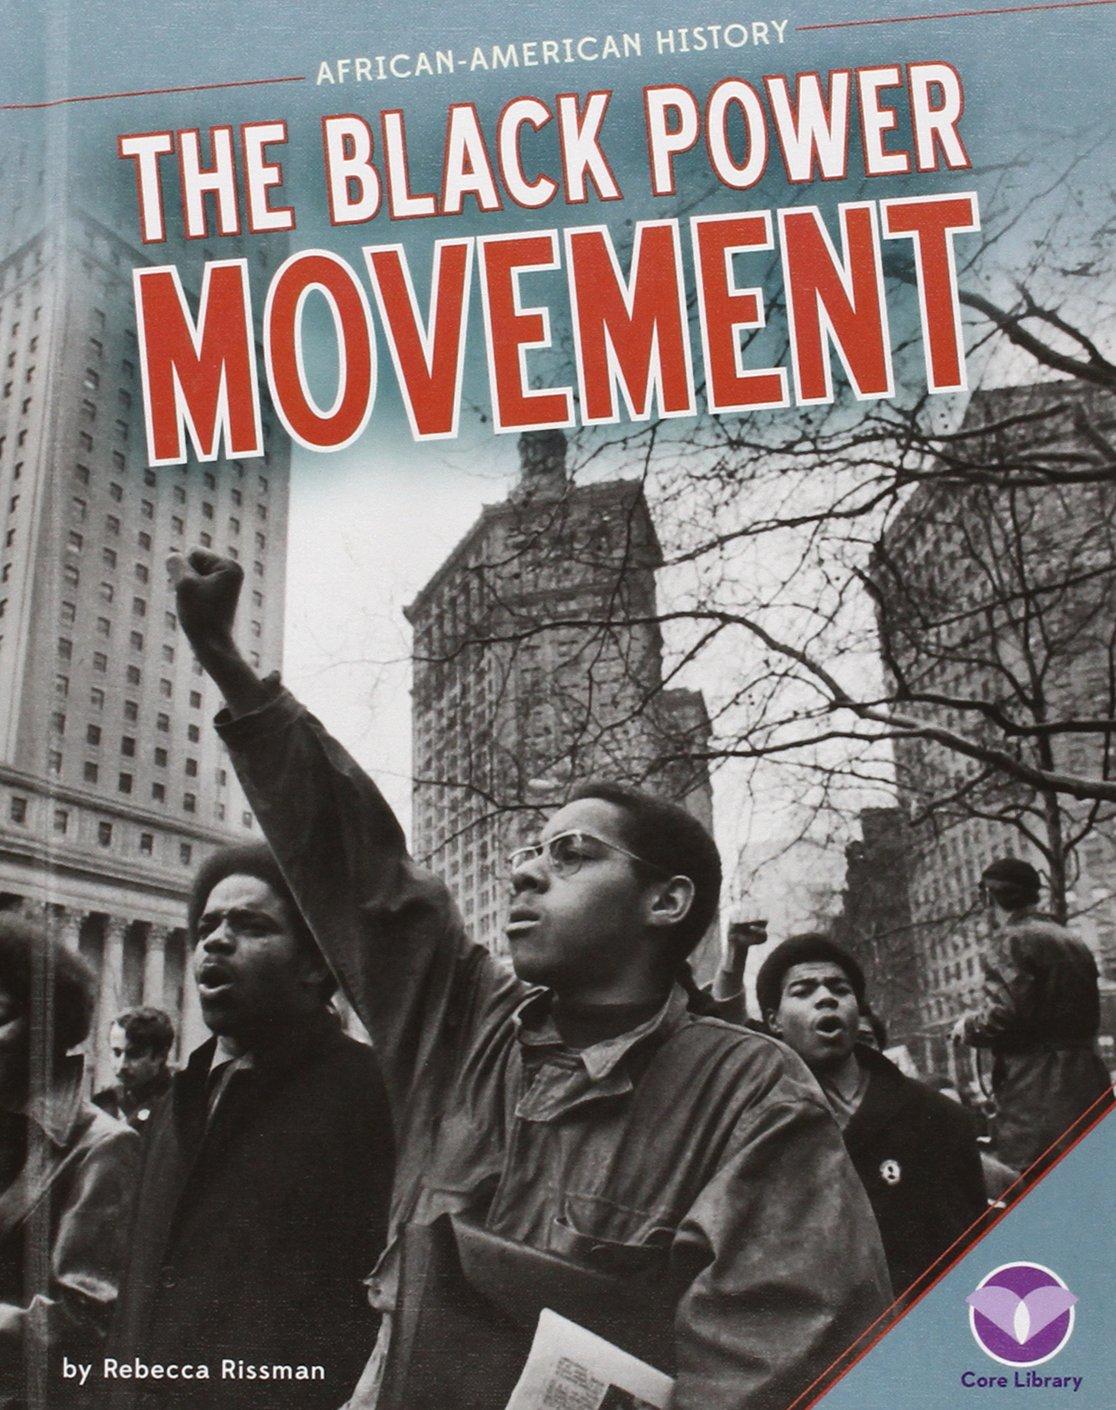 Black Power Movement (African-American History) ebook